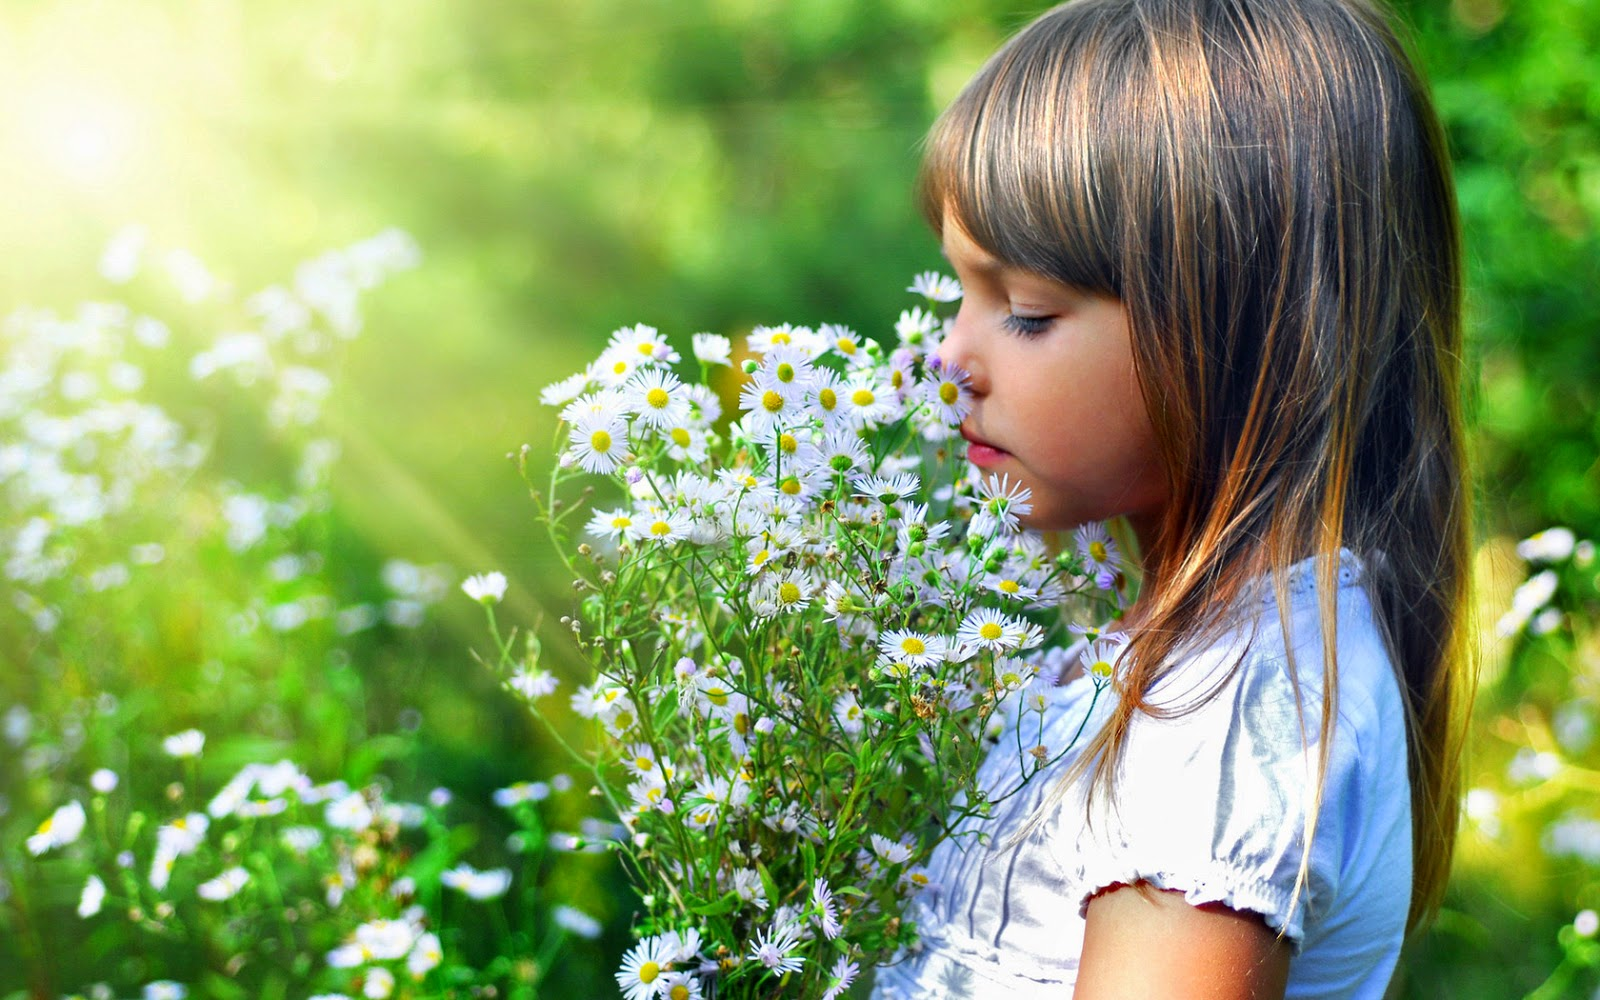 Gambar bayi cantik bermain di taman bunga pakai baju putih